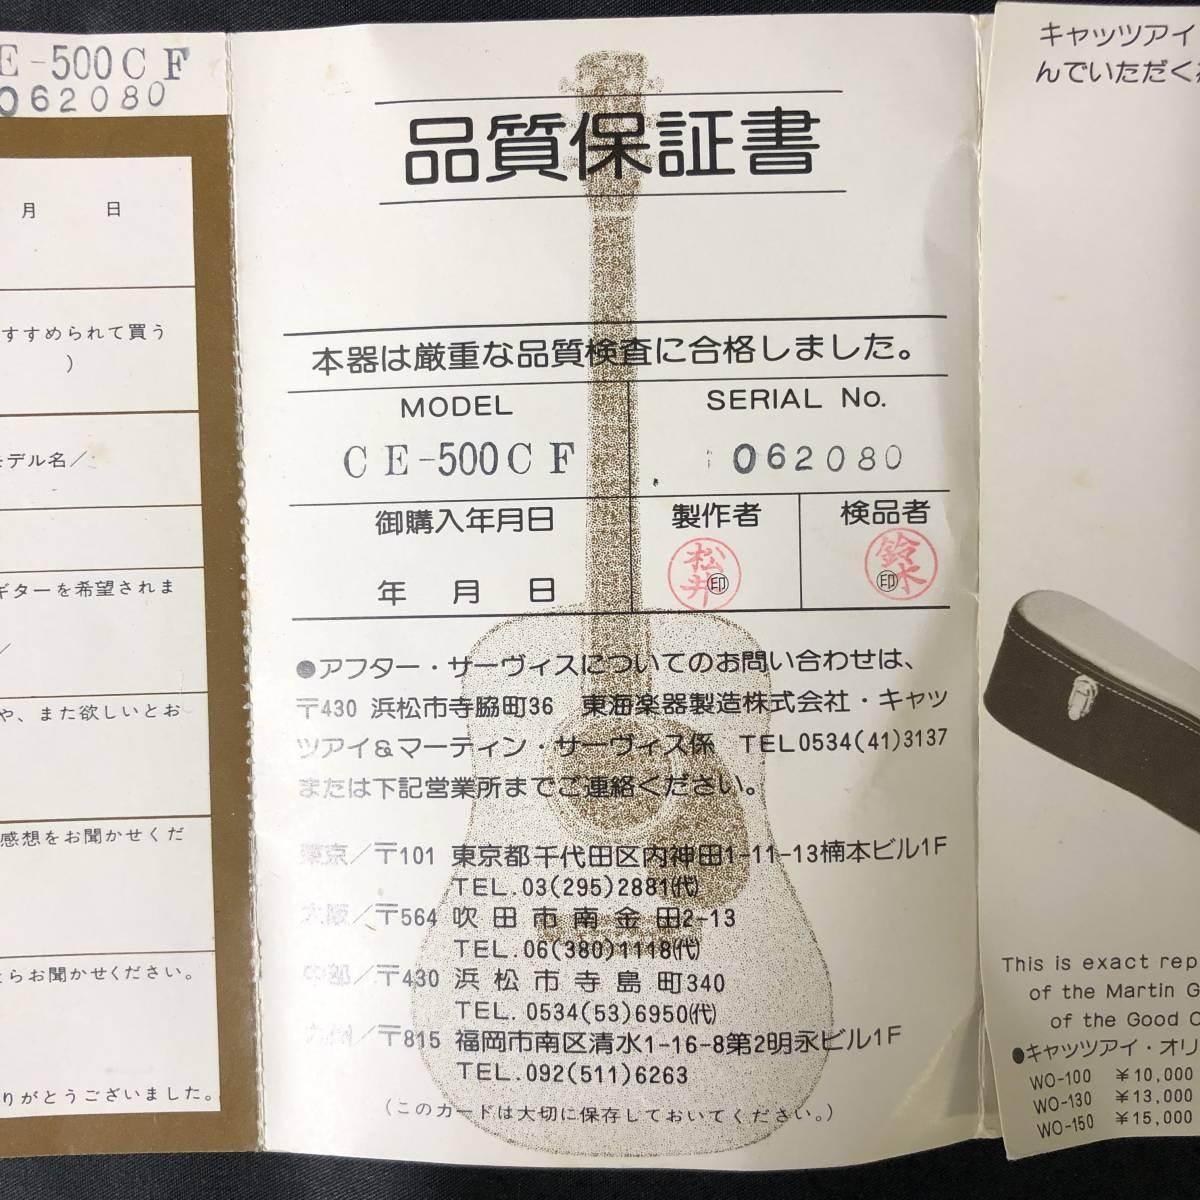 【SS】TOKAI トーカイ 東海楽器 Cat's Eyes MODEL CE500CF キャッツアイ ギターケース ハードケース 動作未確認 中古 レトロ ヴィンテージ_画像10